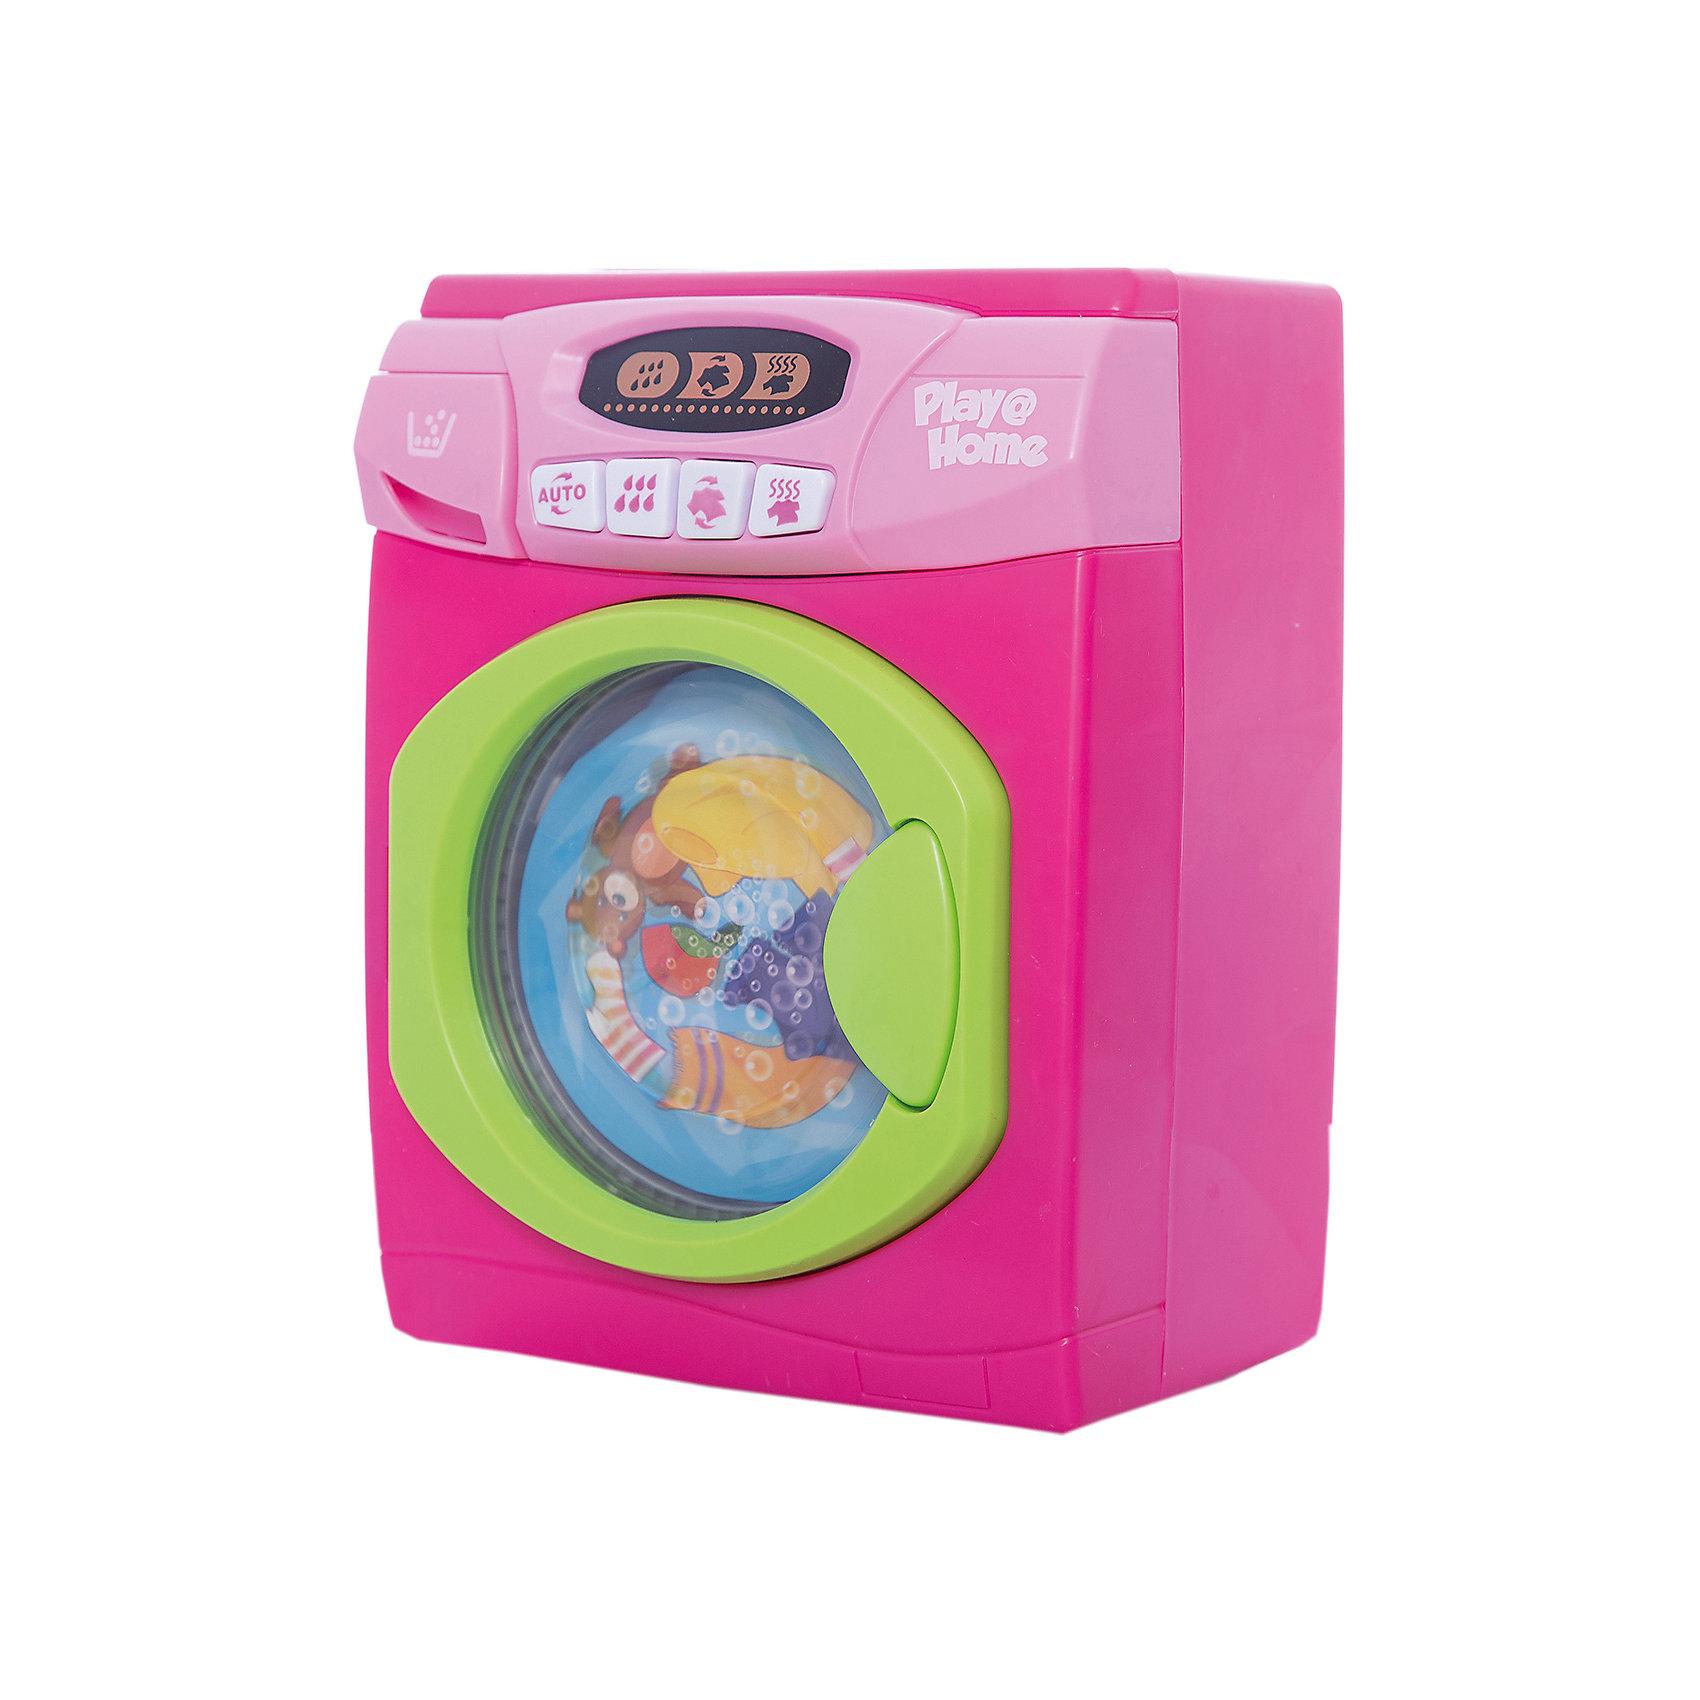 Keenway Стиральная машинка, Keenway стиральная машинка малютка москва